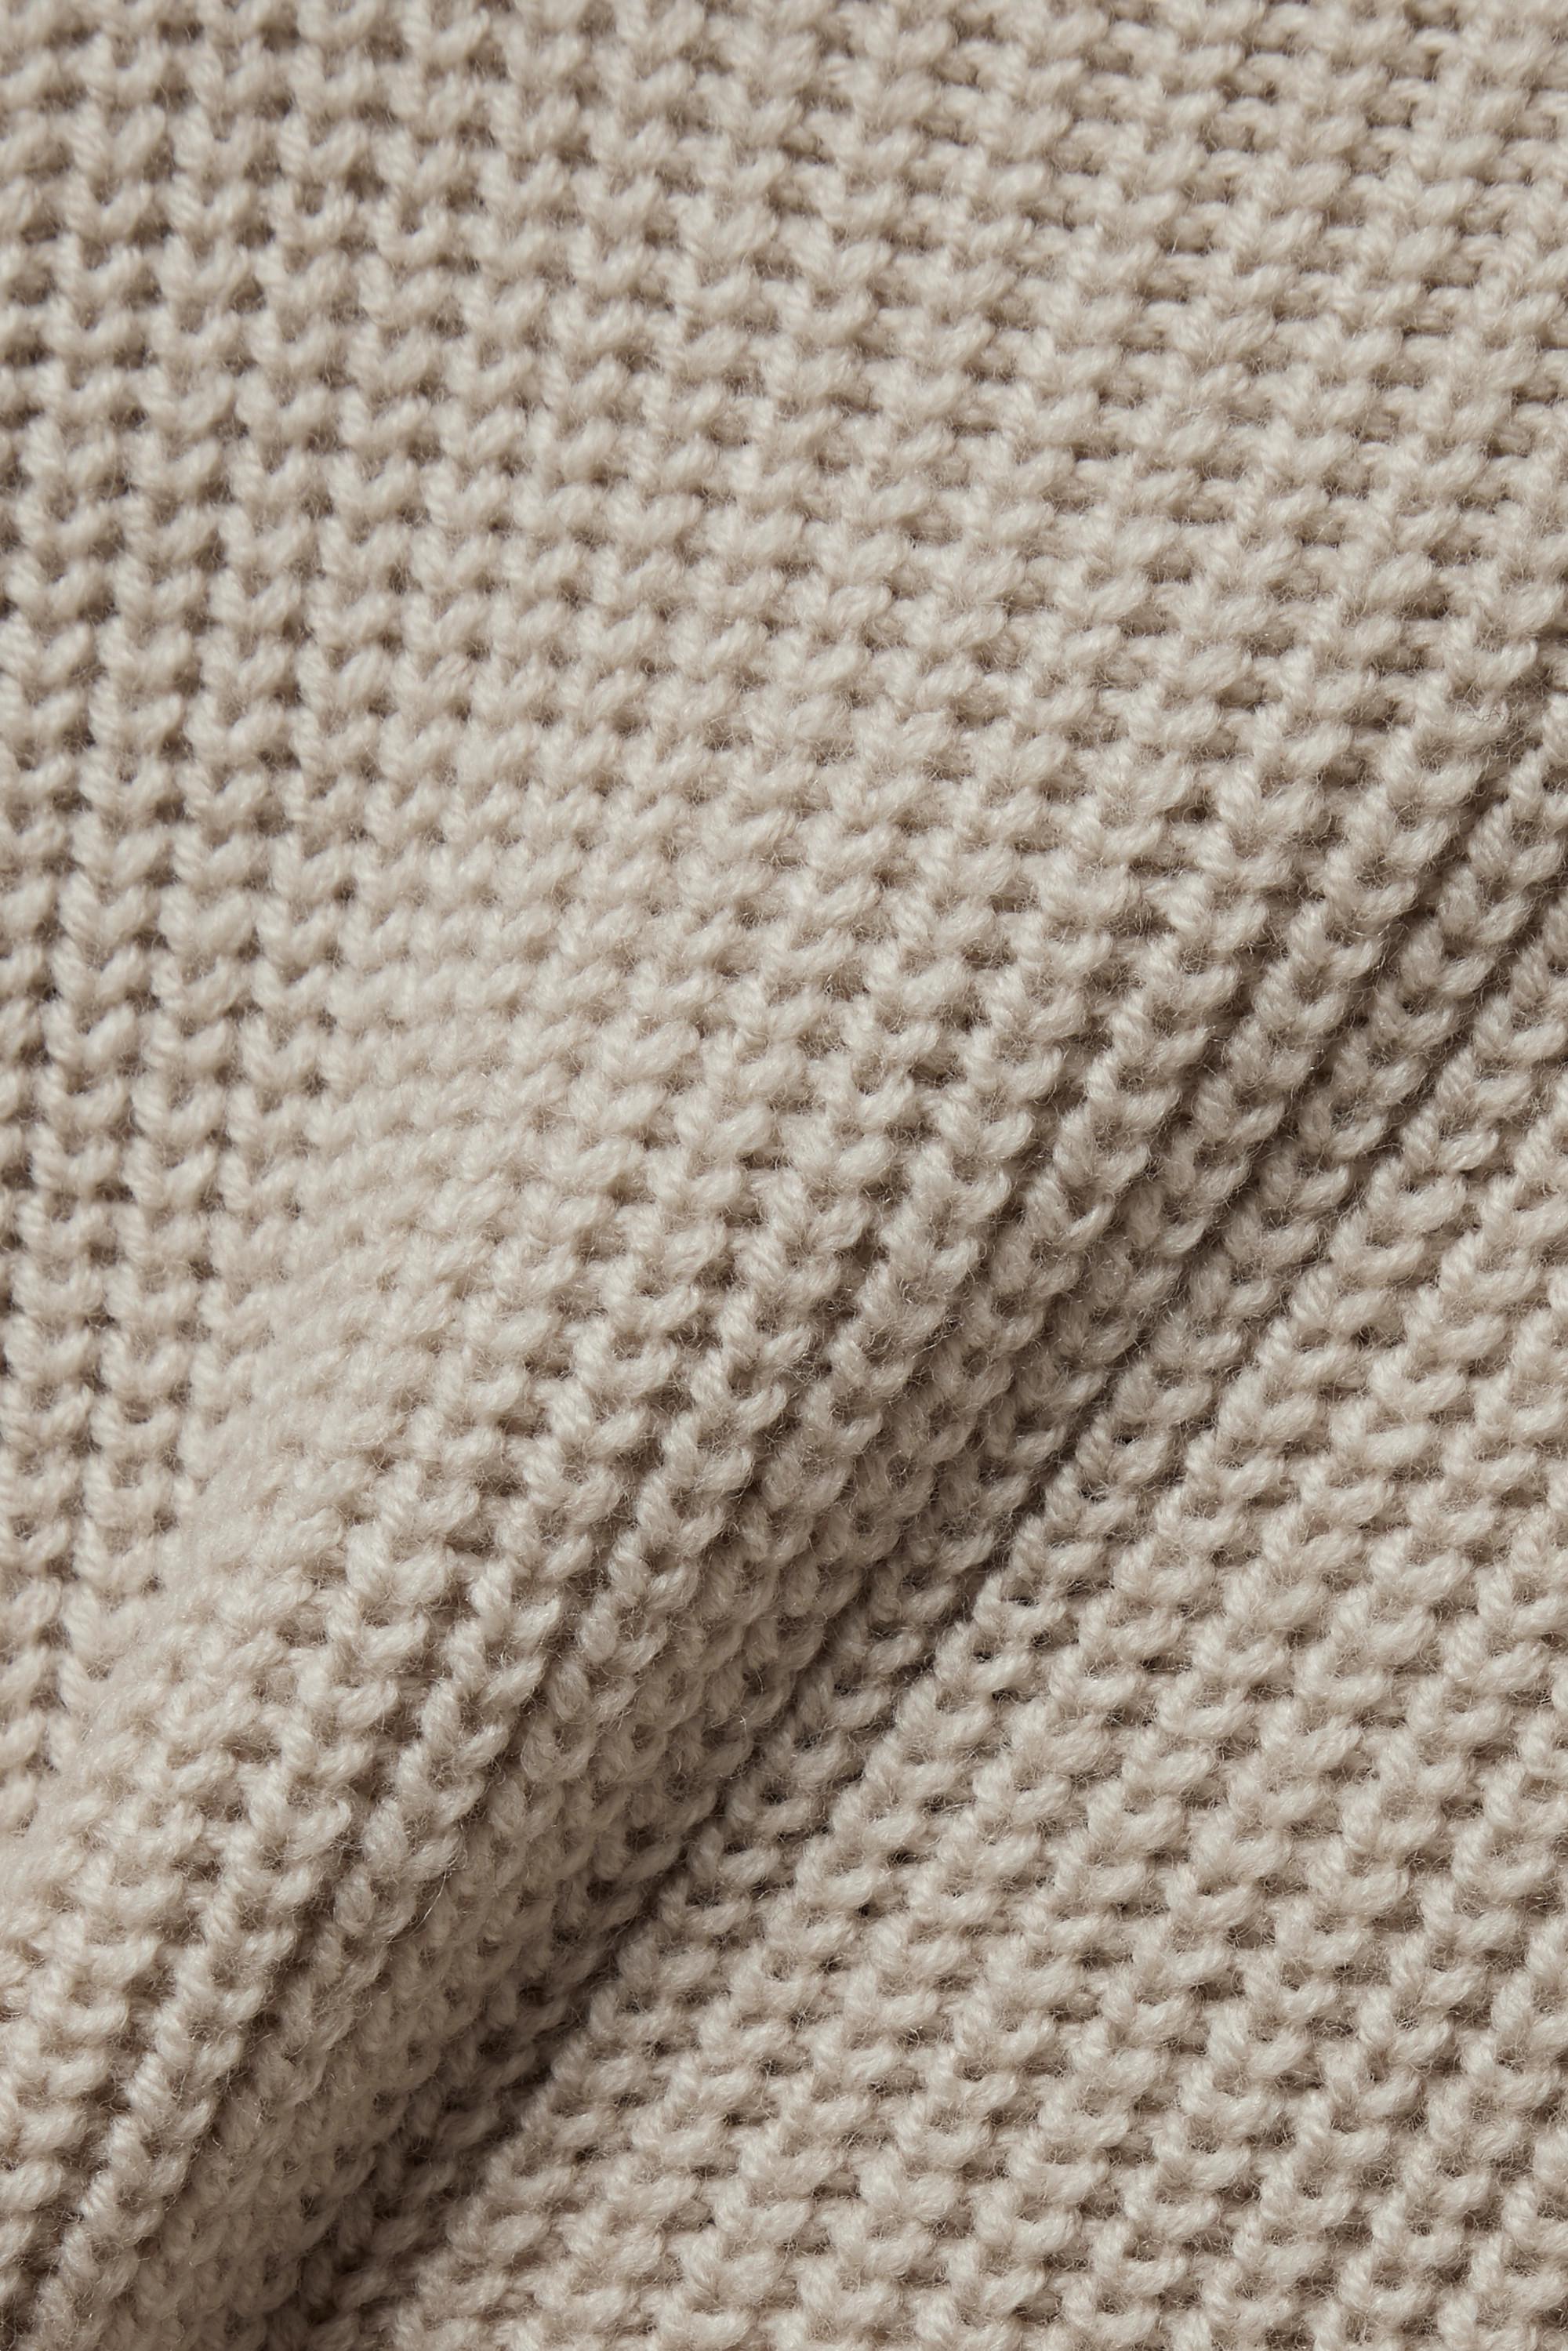 Proenza Schouler Asymmetric ribbed merino wool turtleneck sweater